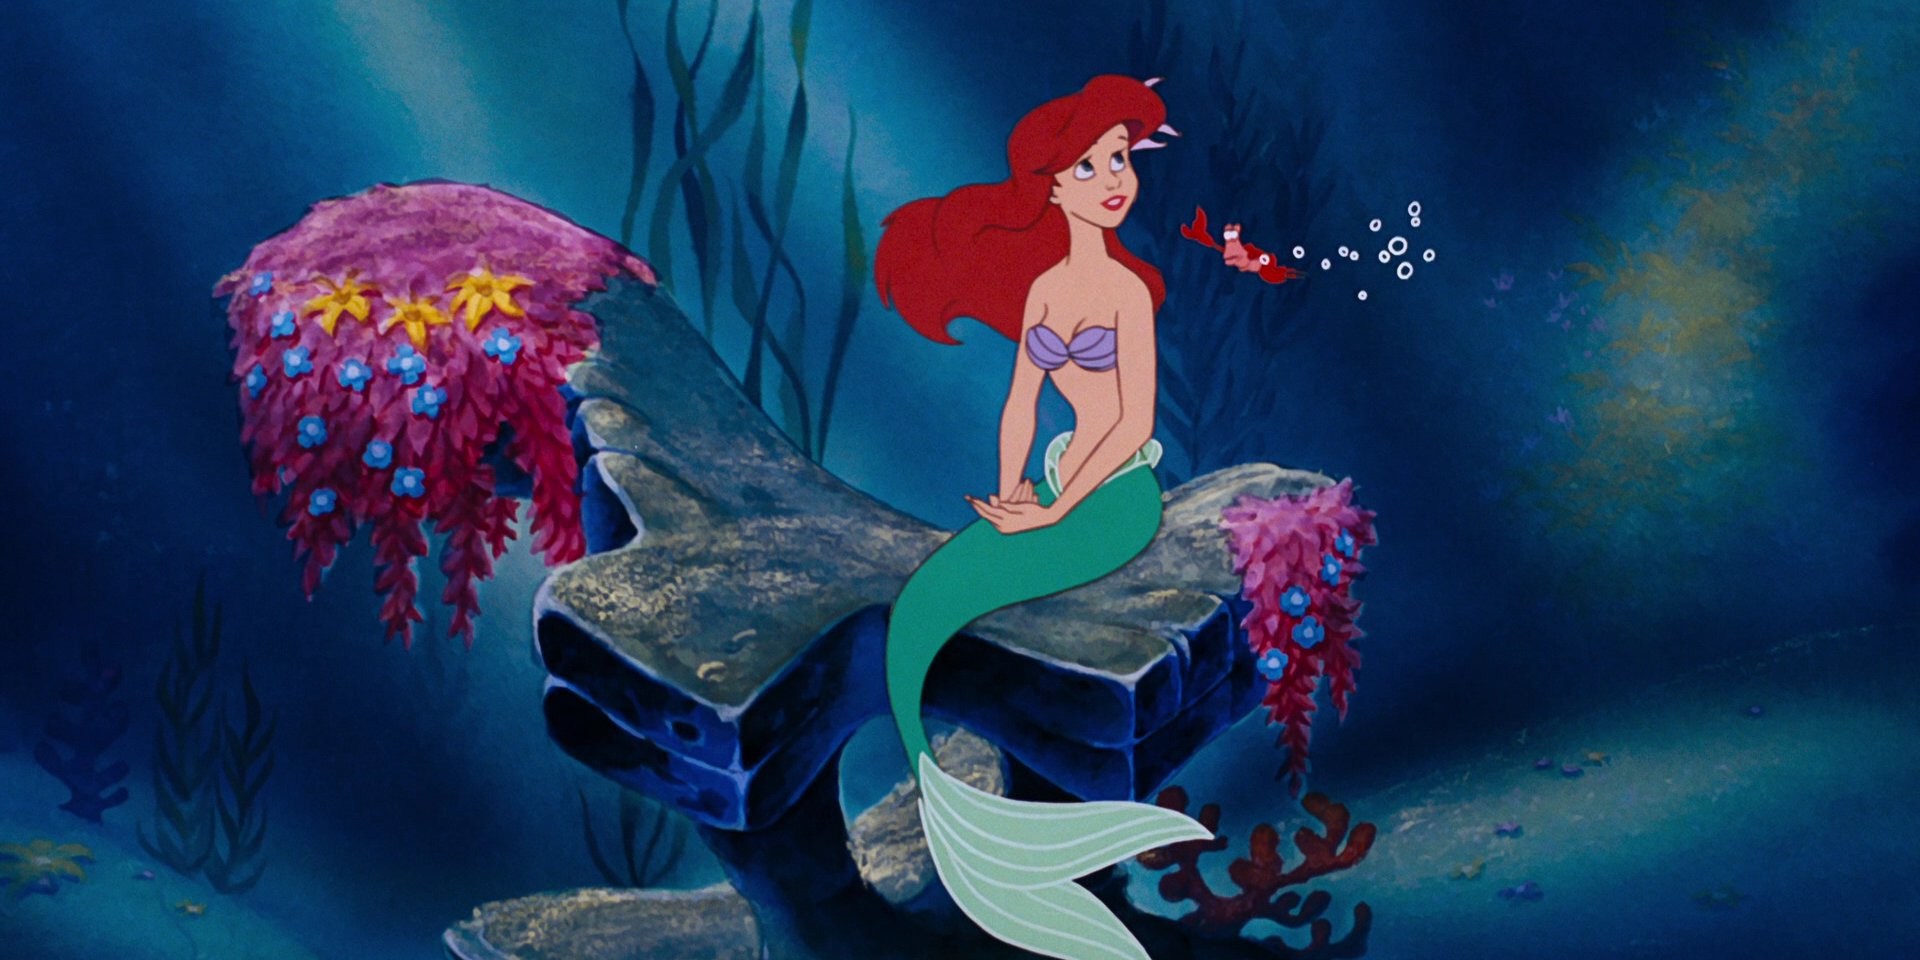 The Little Mermaid Disorder